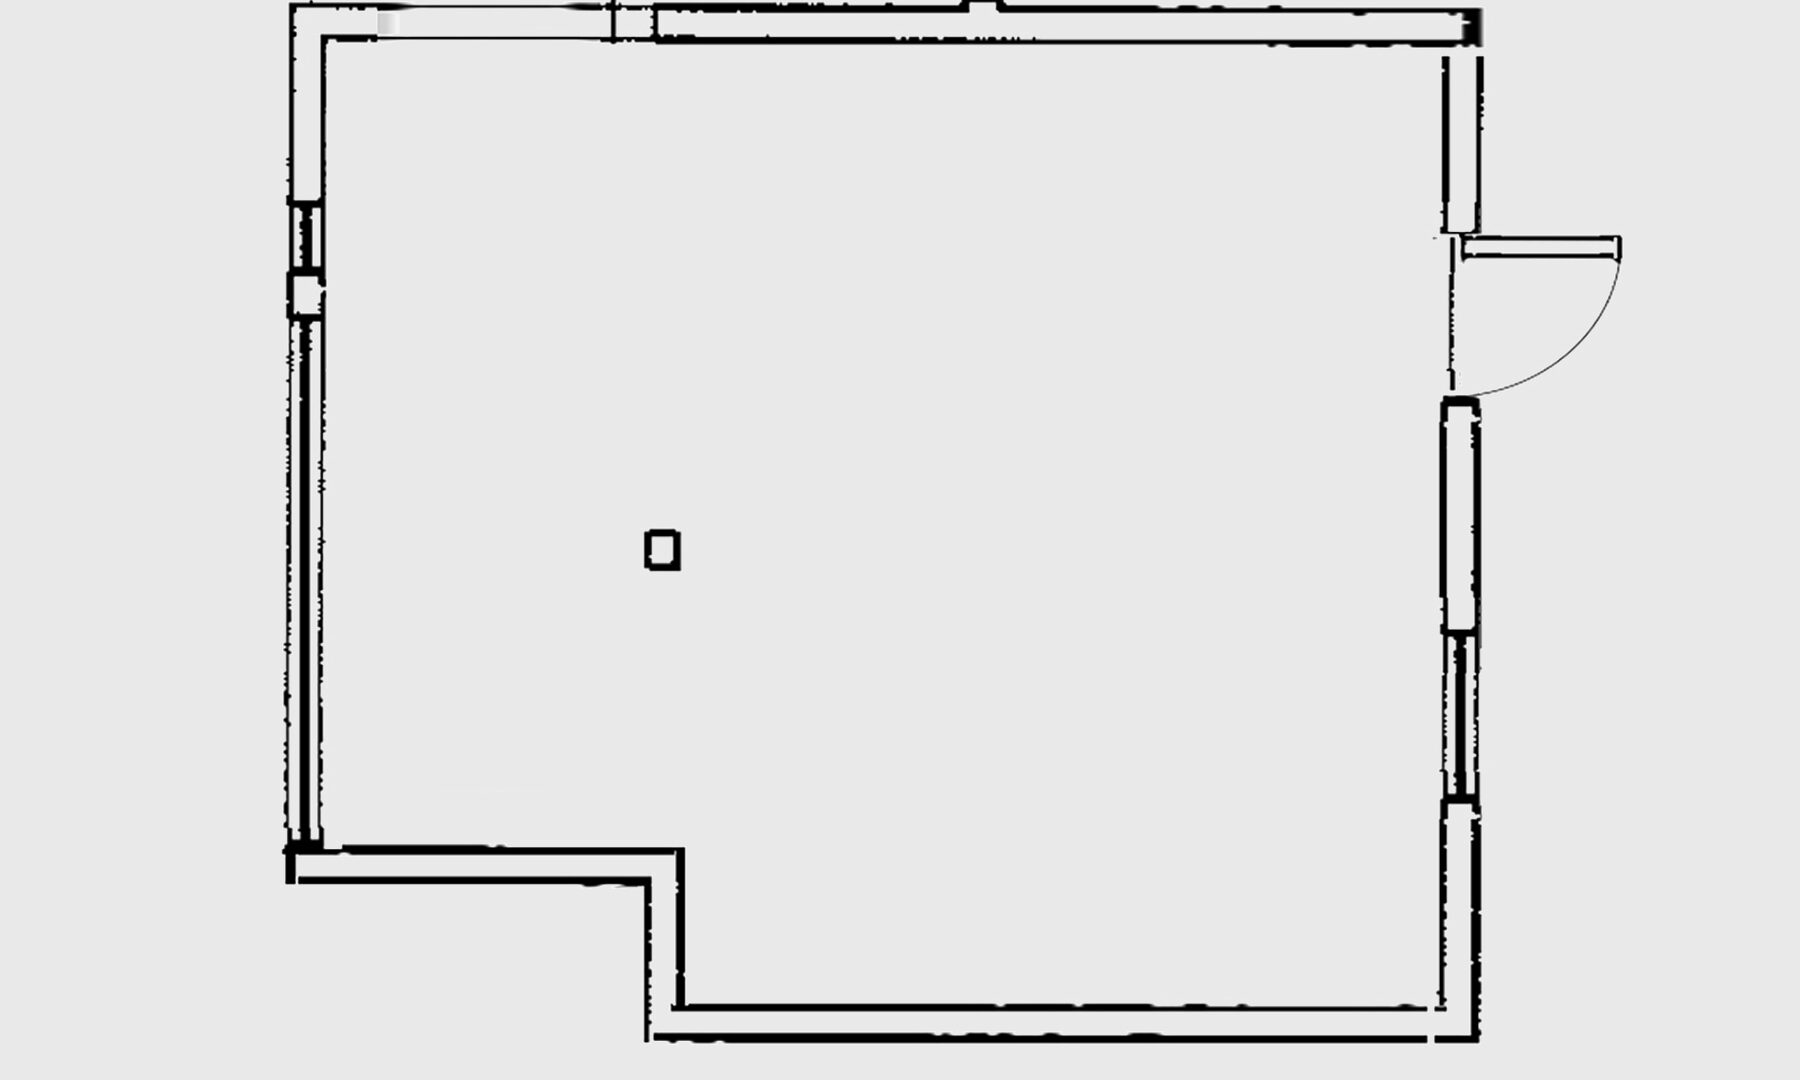 Trecentosessanta metri cubi circa